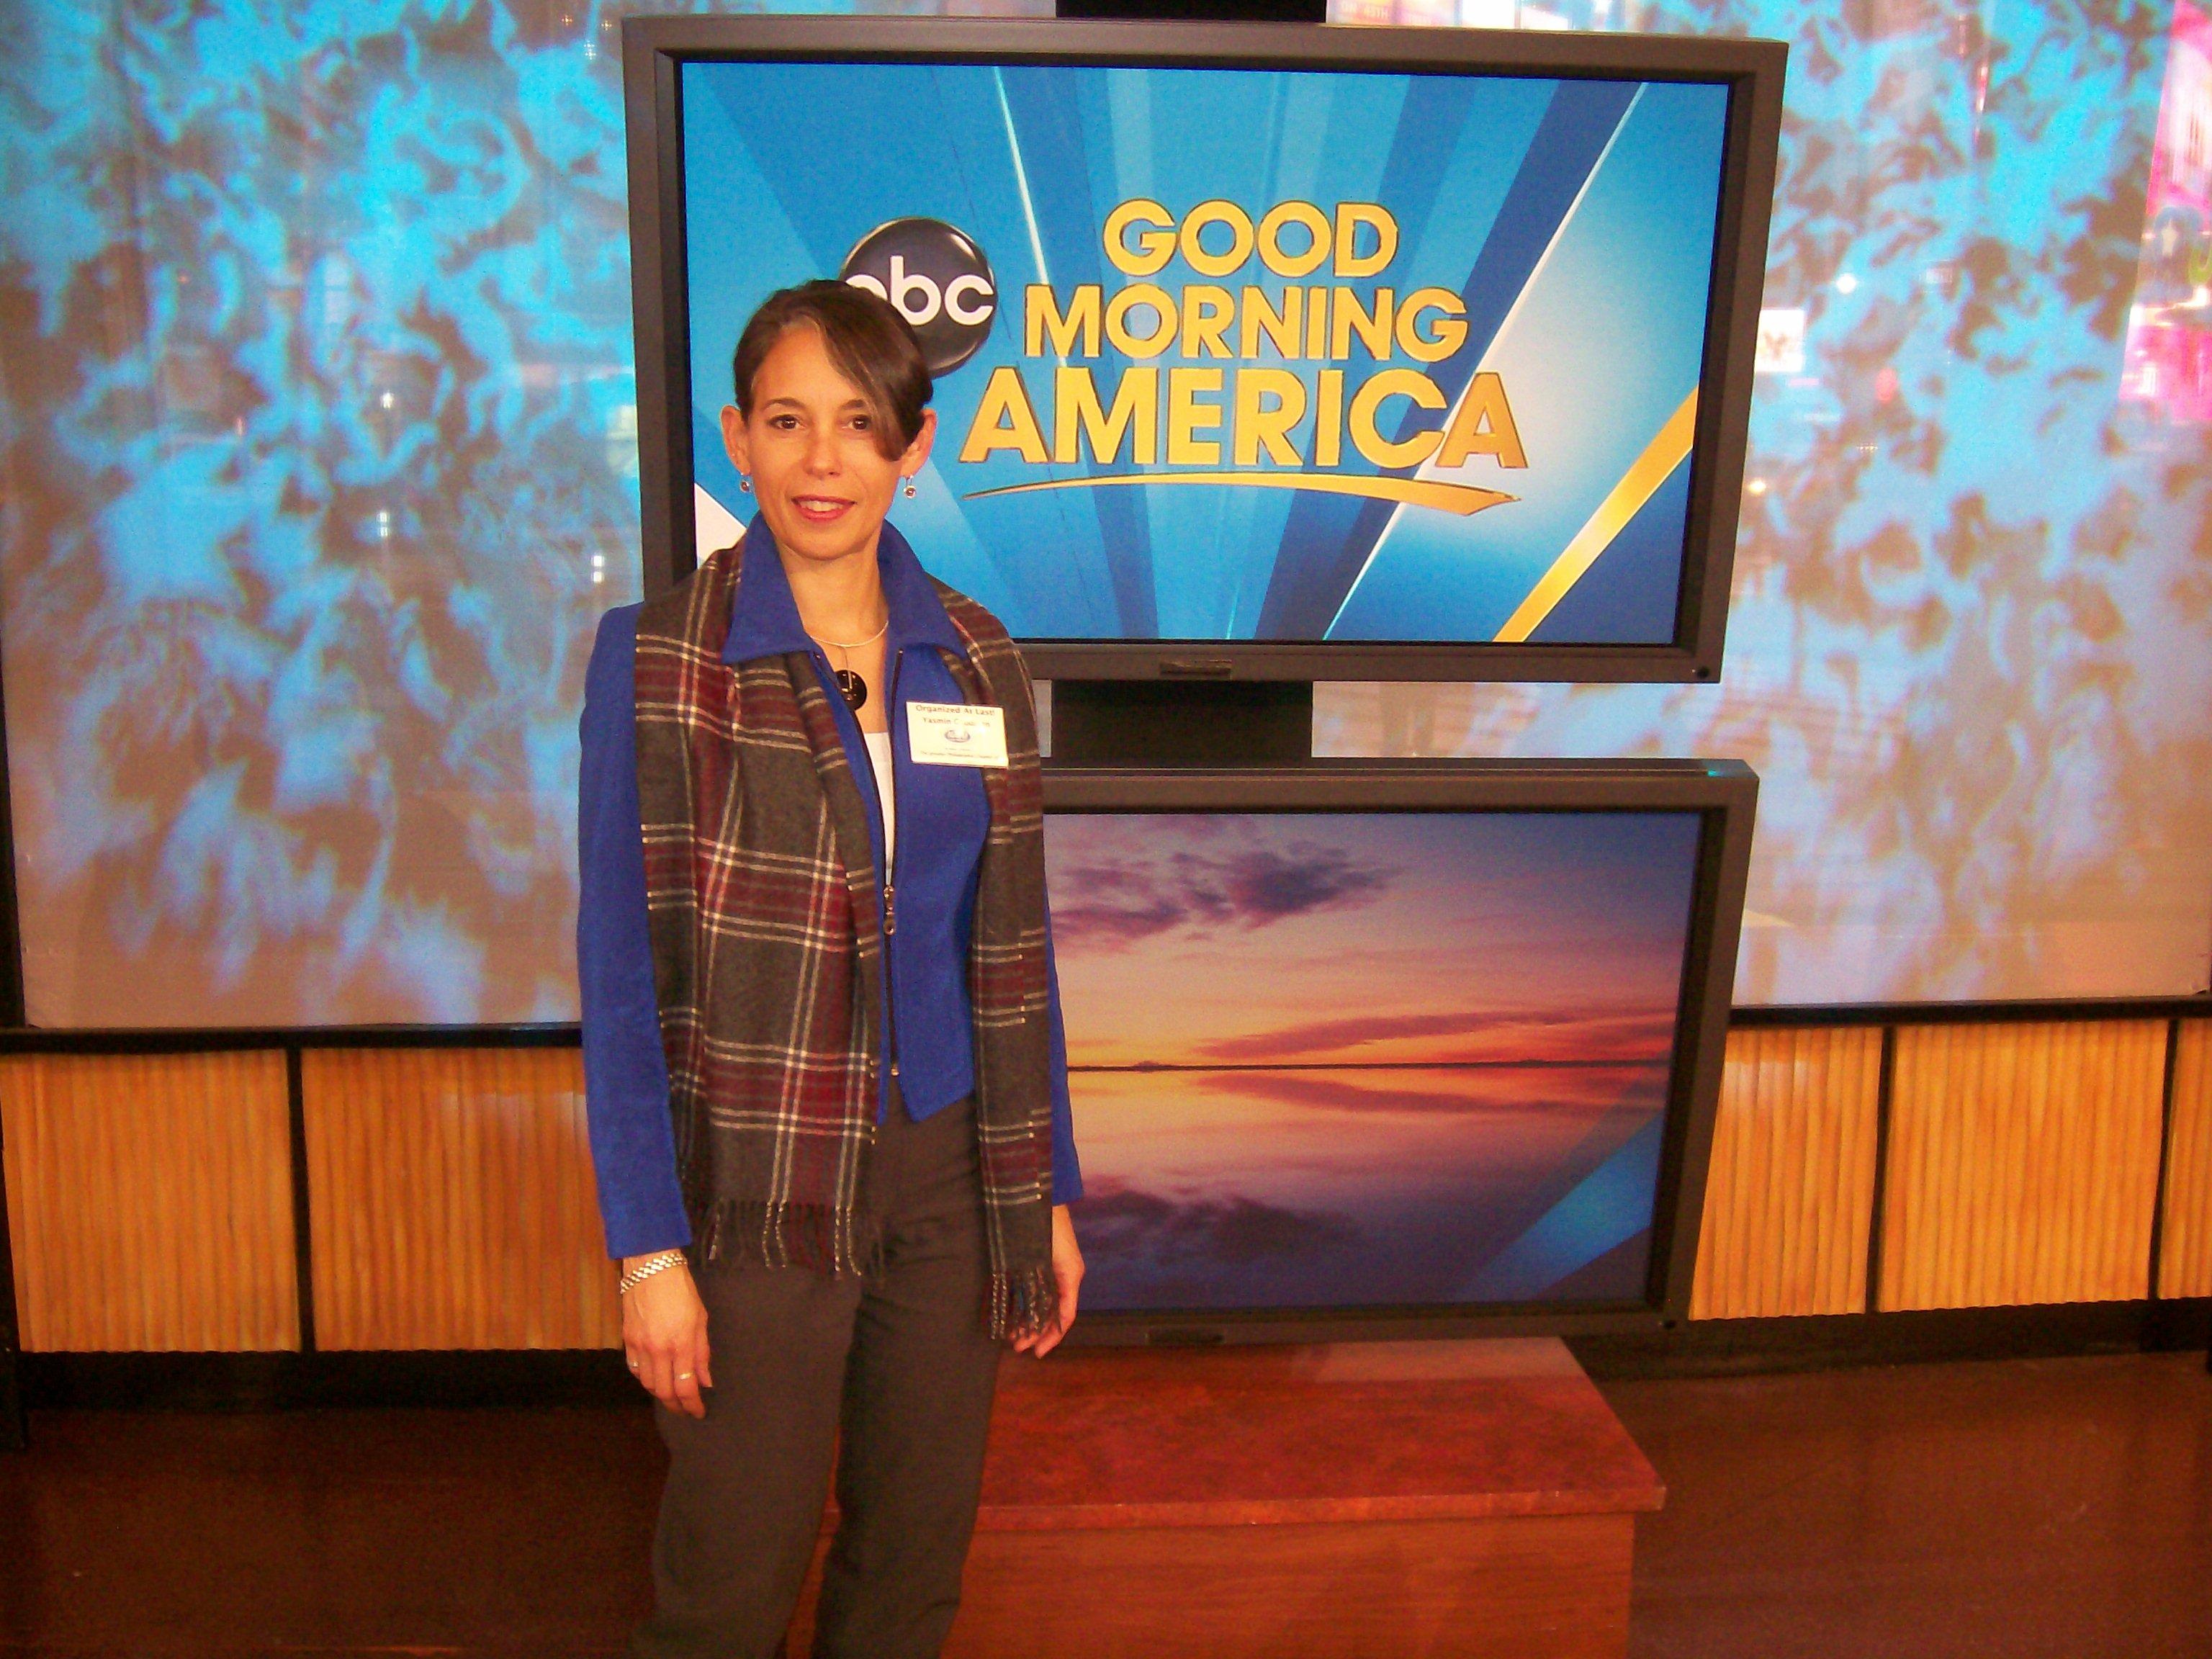 Good Morning America 2011